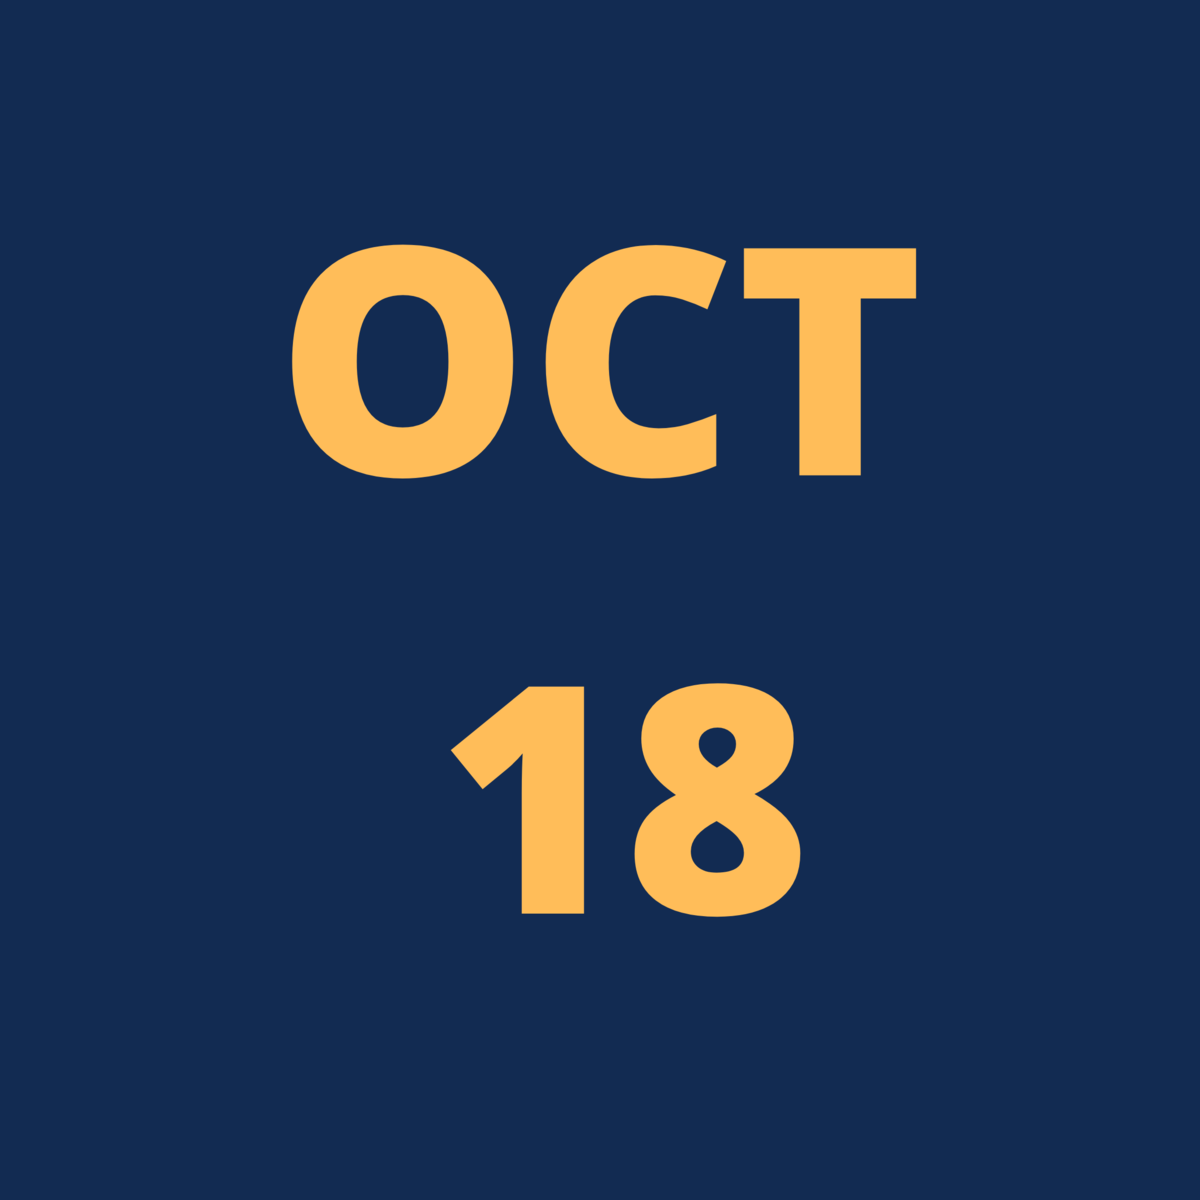 Oct 18 Icon